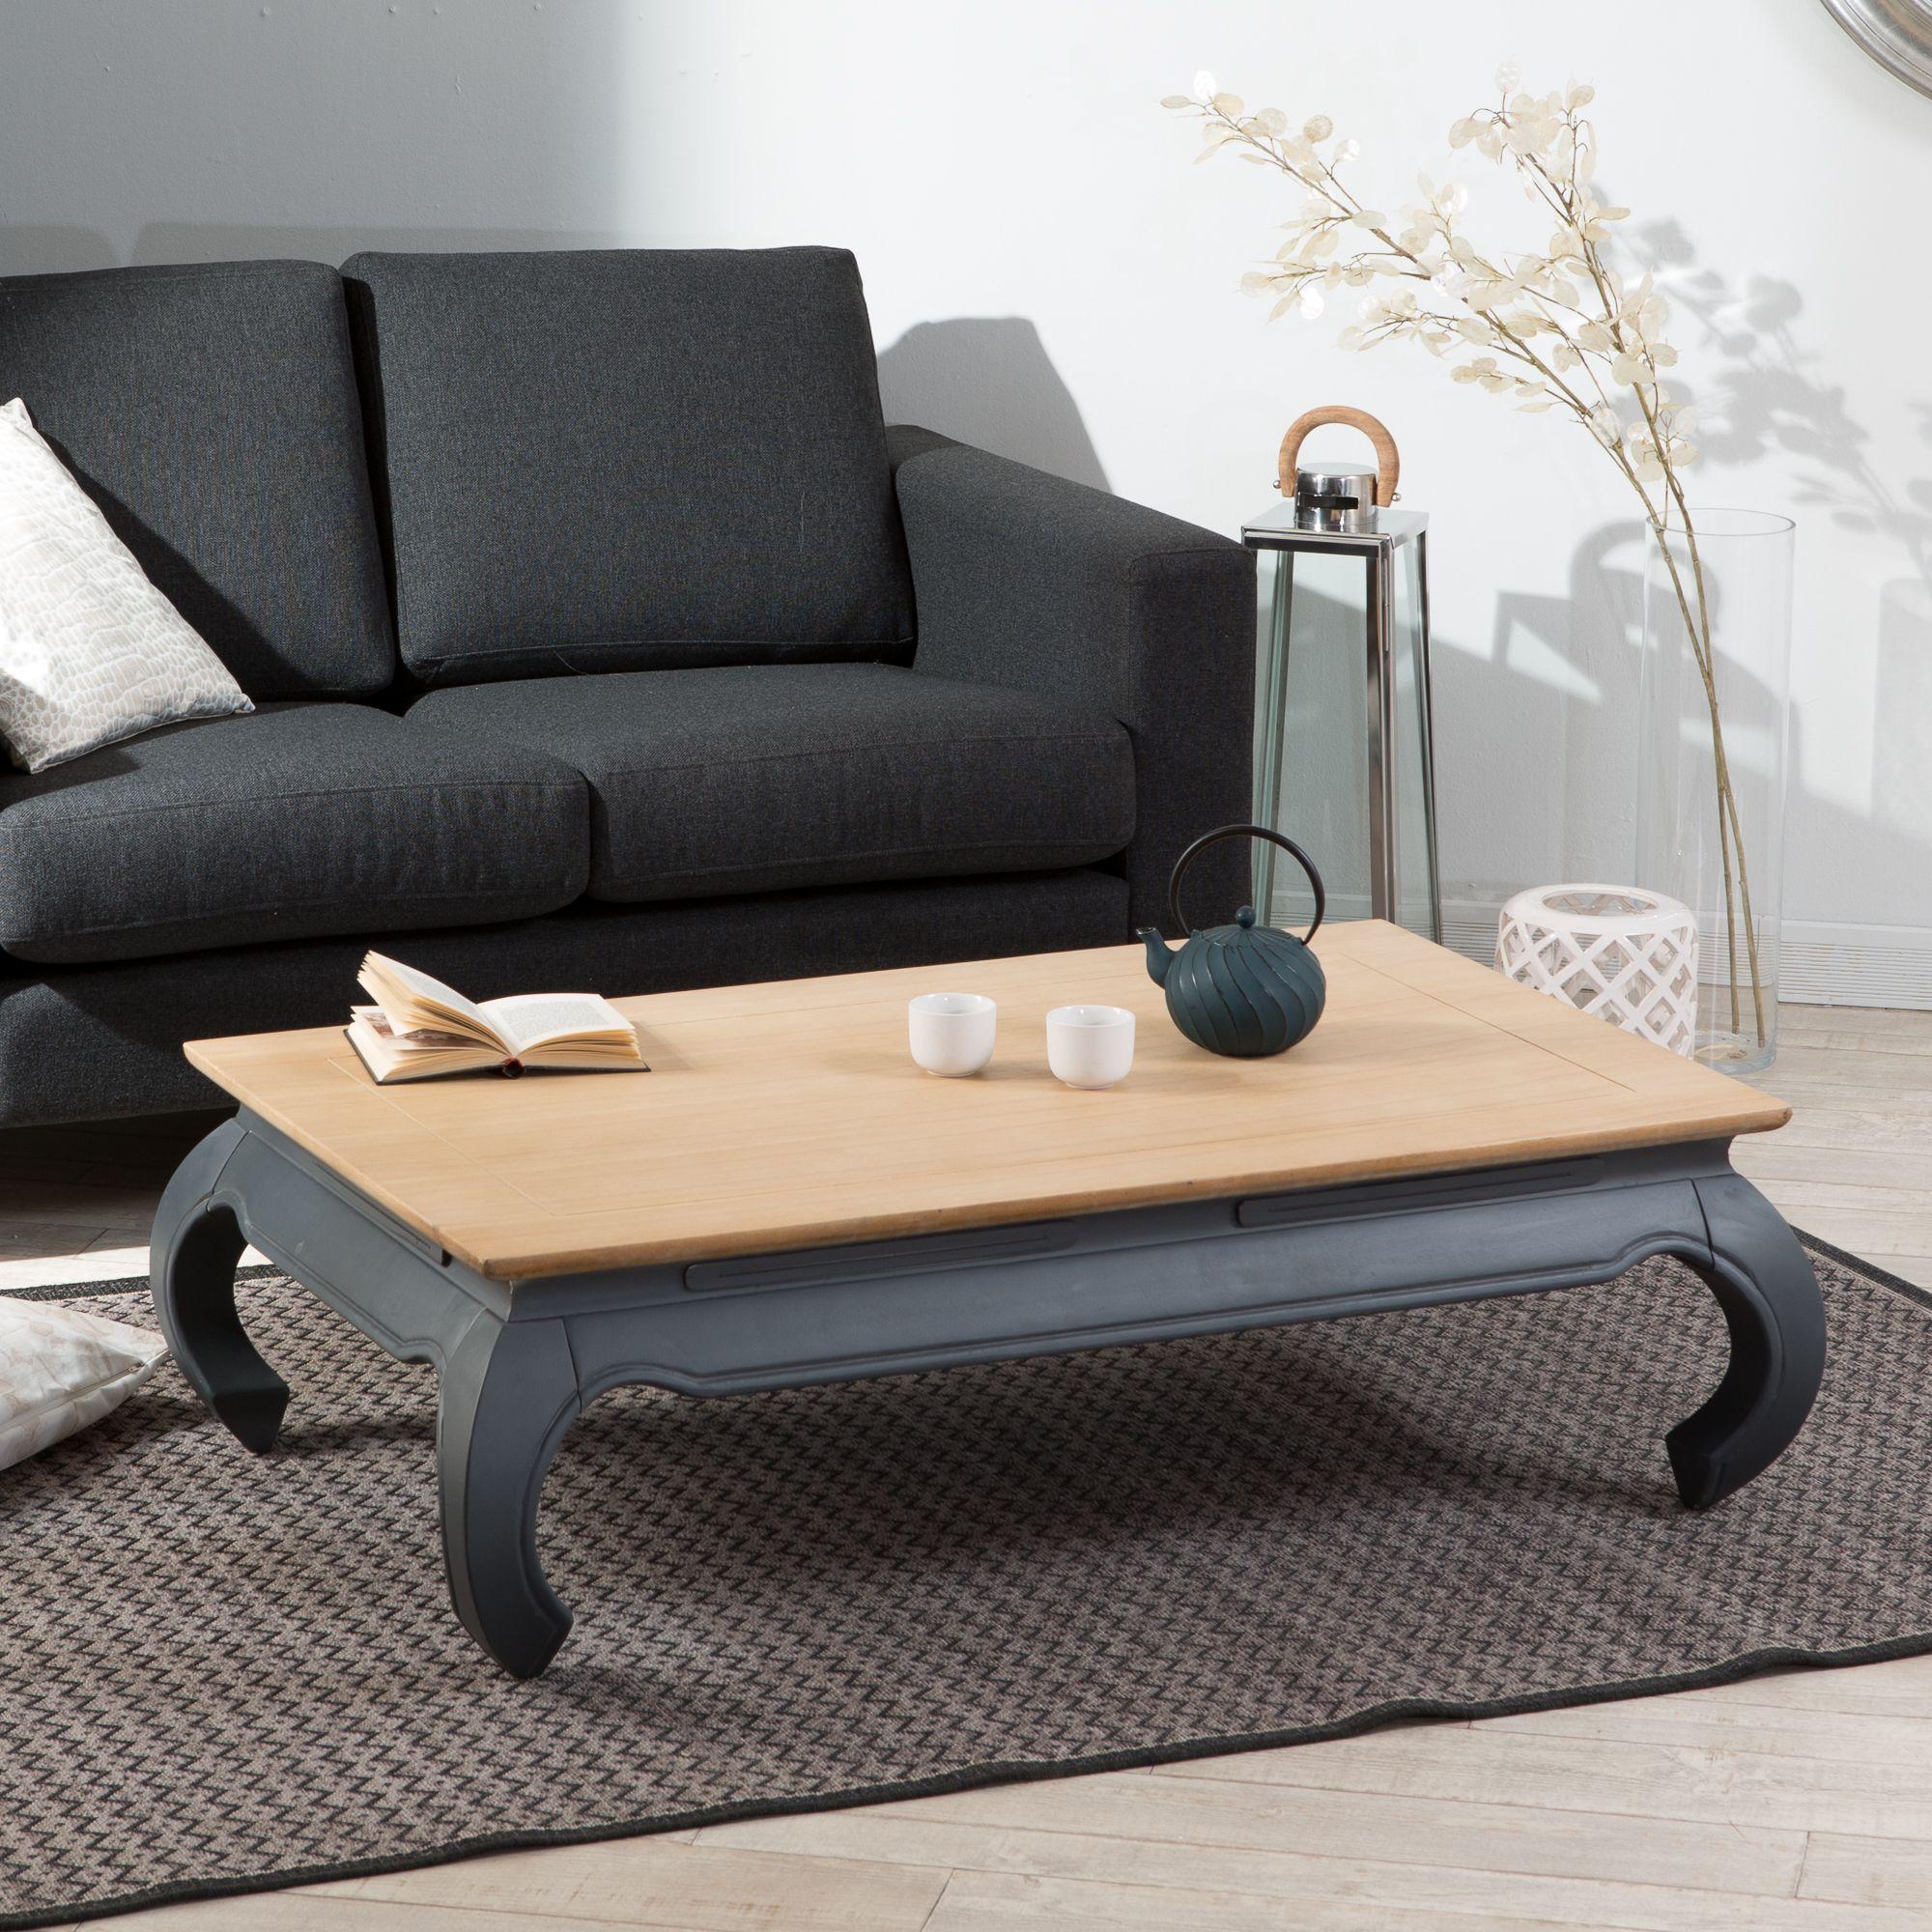 table basse rectangulaire opium en manguier massif colonia marque haveli republic au. Black Bedroom Furniture Sets. Home Design Ideas